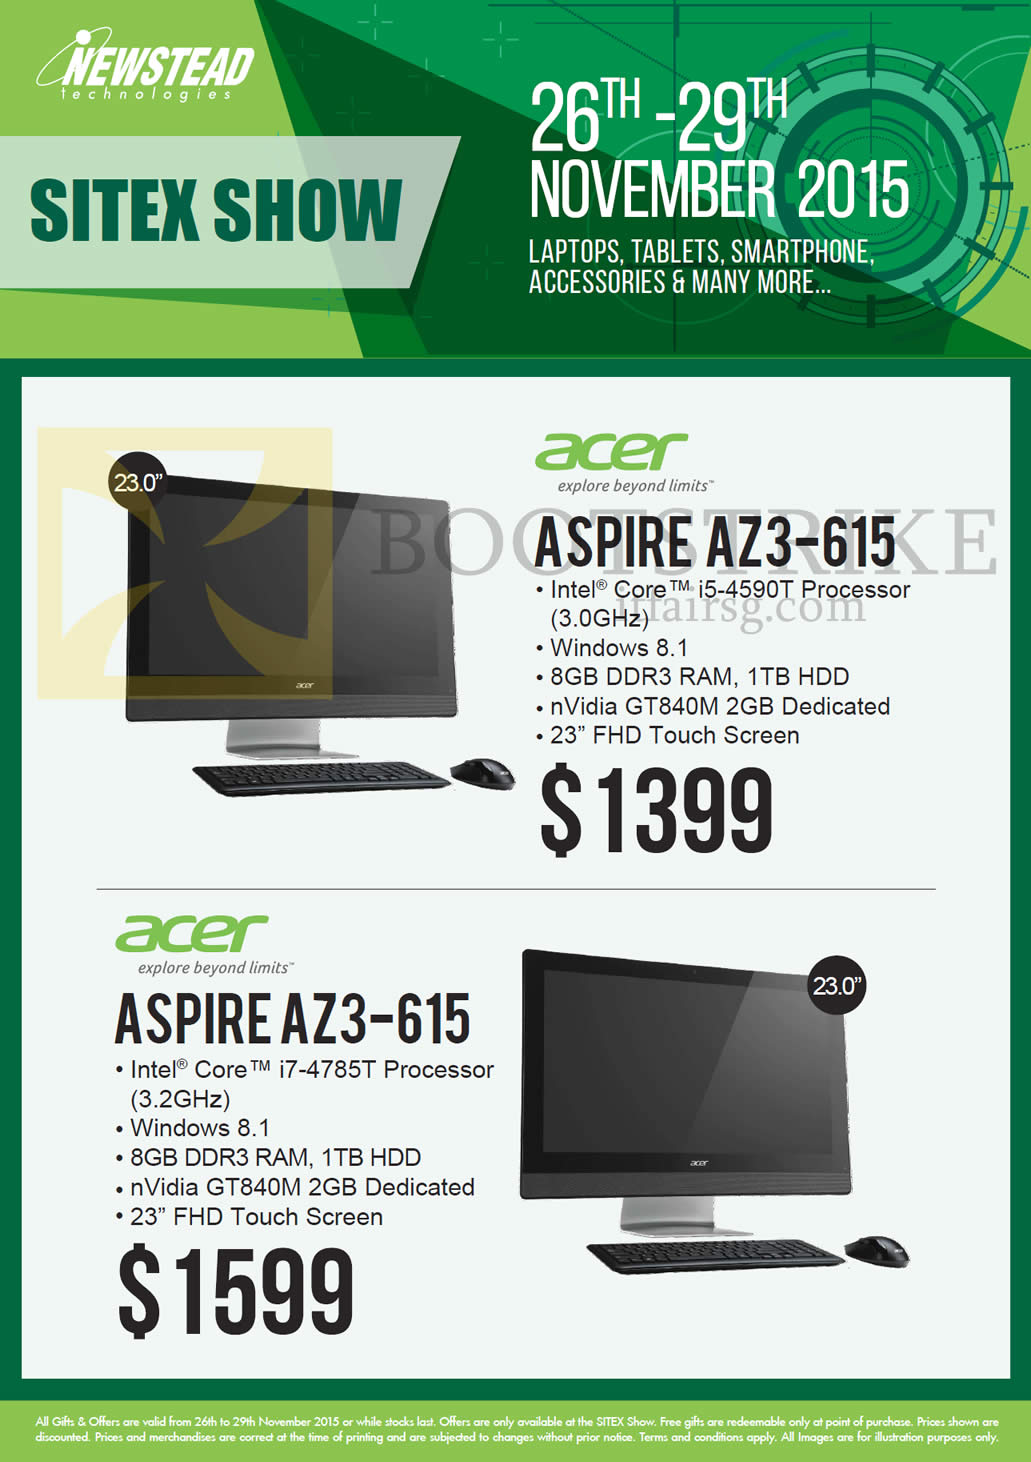 SITEX 2015 price list image brochure of Acer Newstead AIO Desktop PCs, Aspire AZ3-615, Aspire AZ3-615